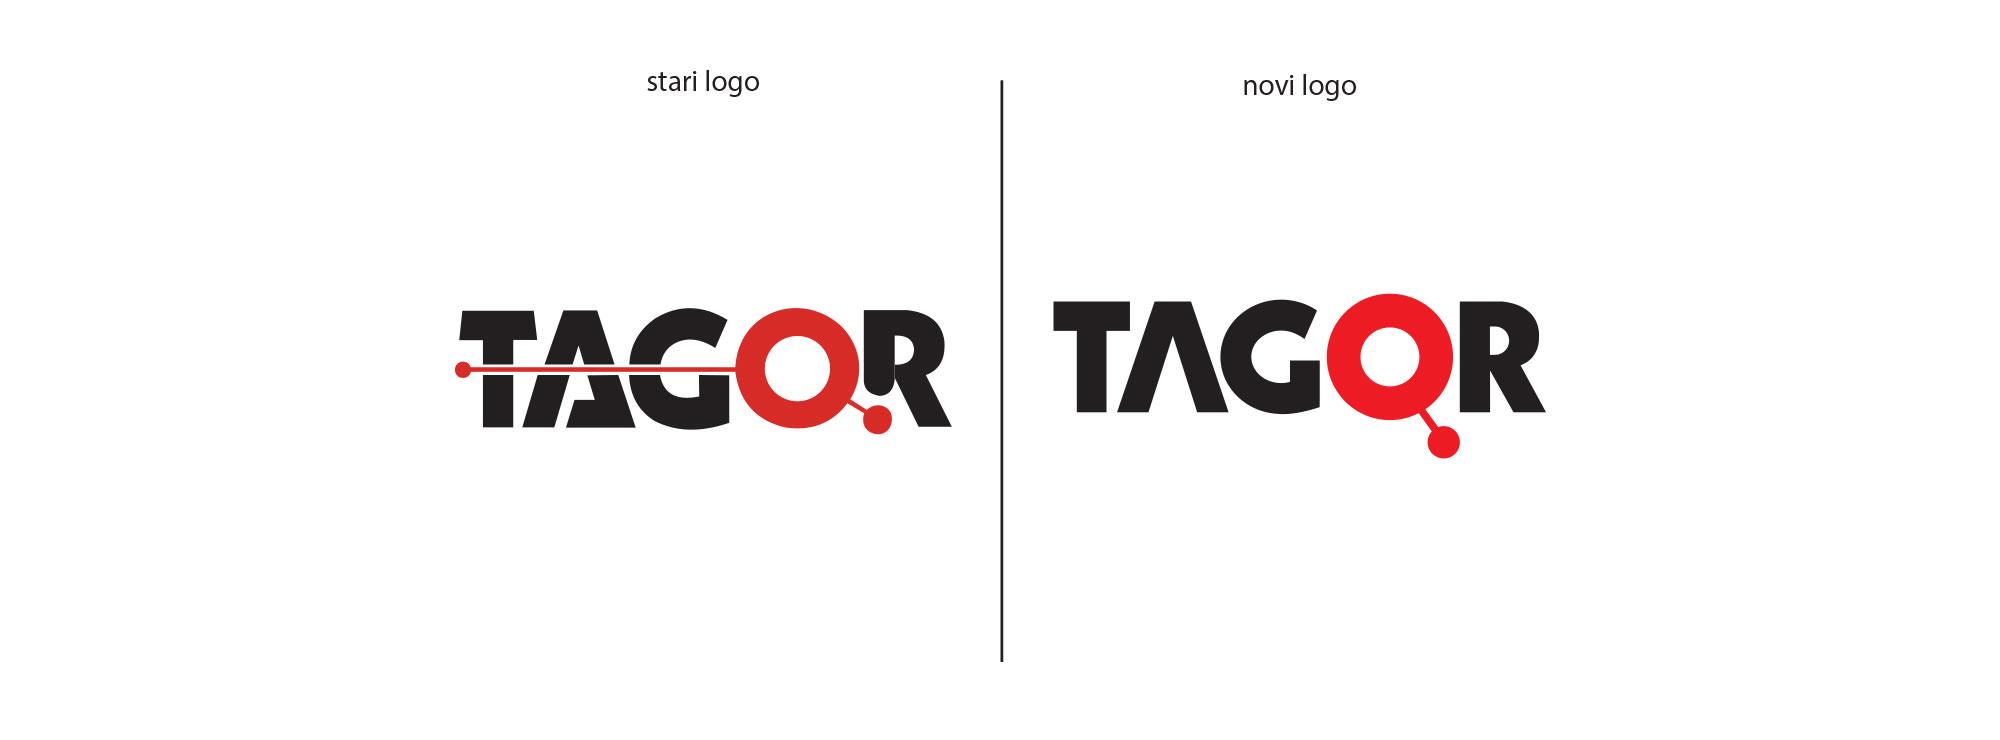 tagor logo redesign